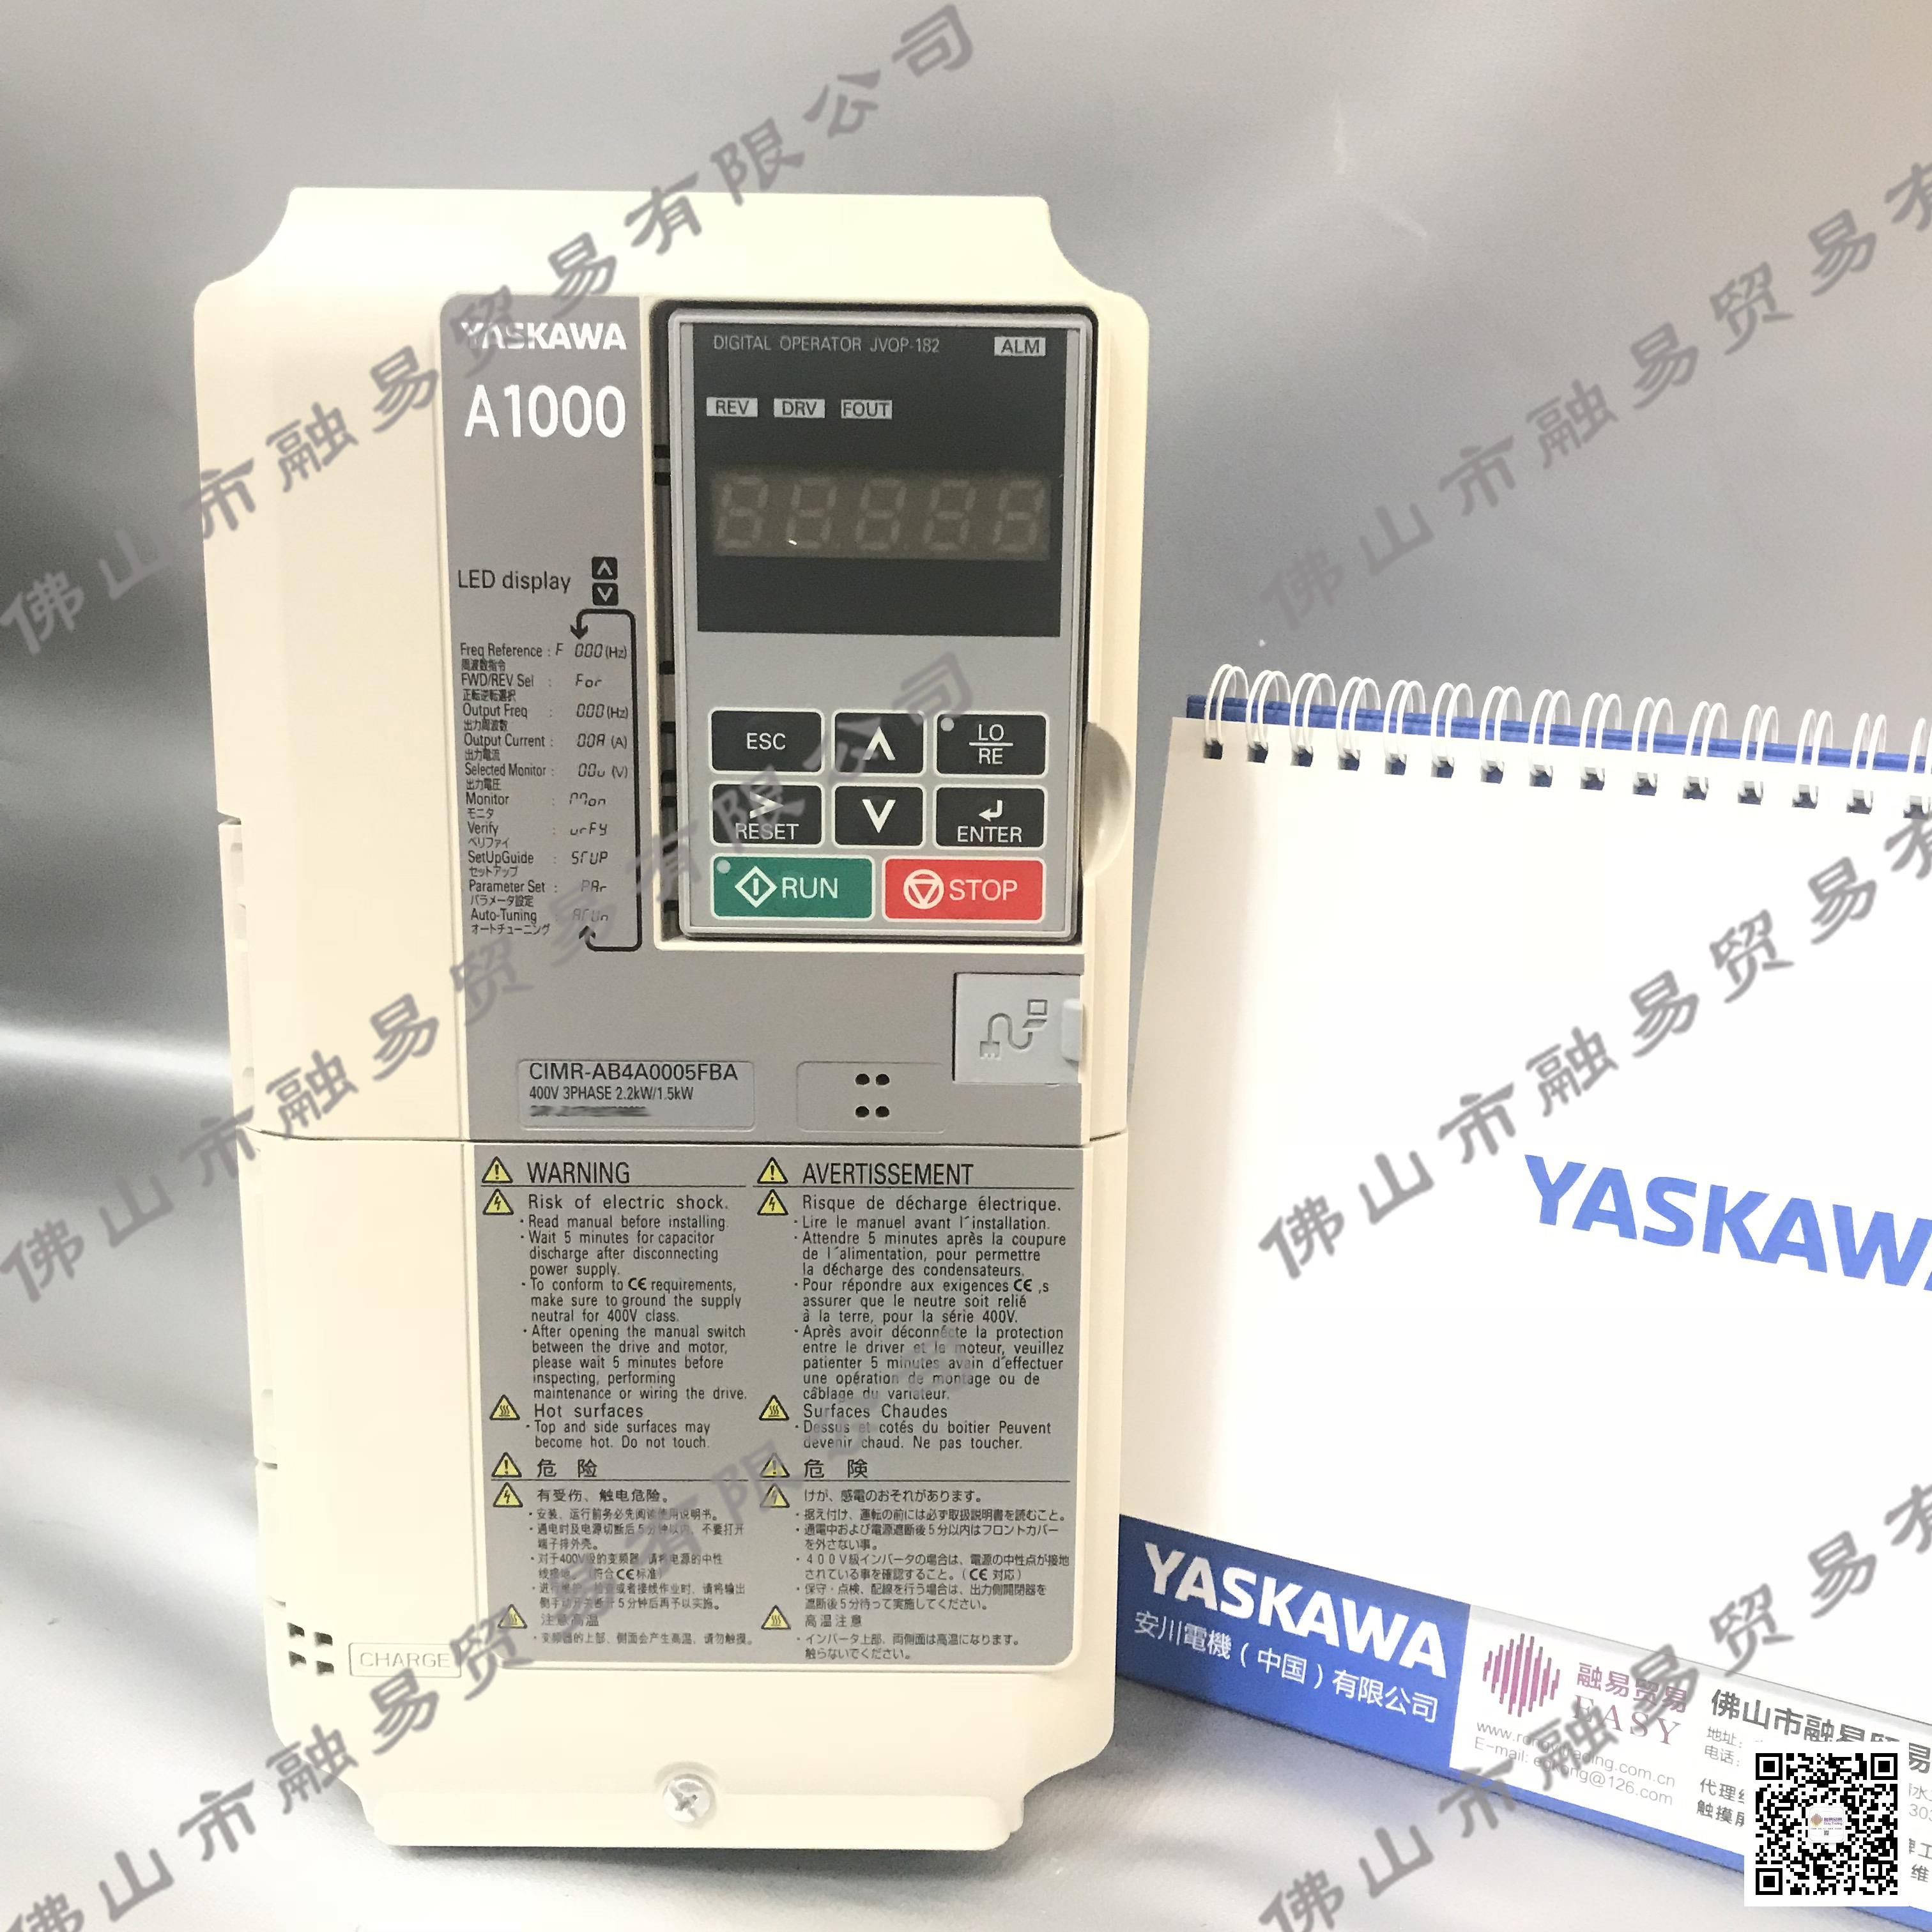 YASKAWA A1000变频器1.5W CIMR-AB4A0005FBA /三相380V